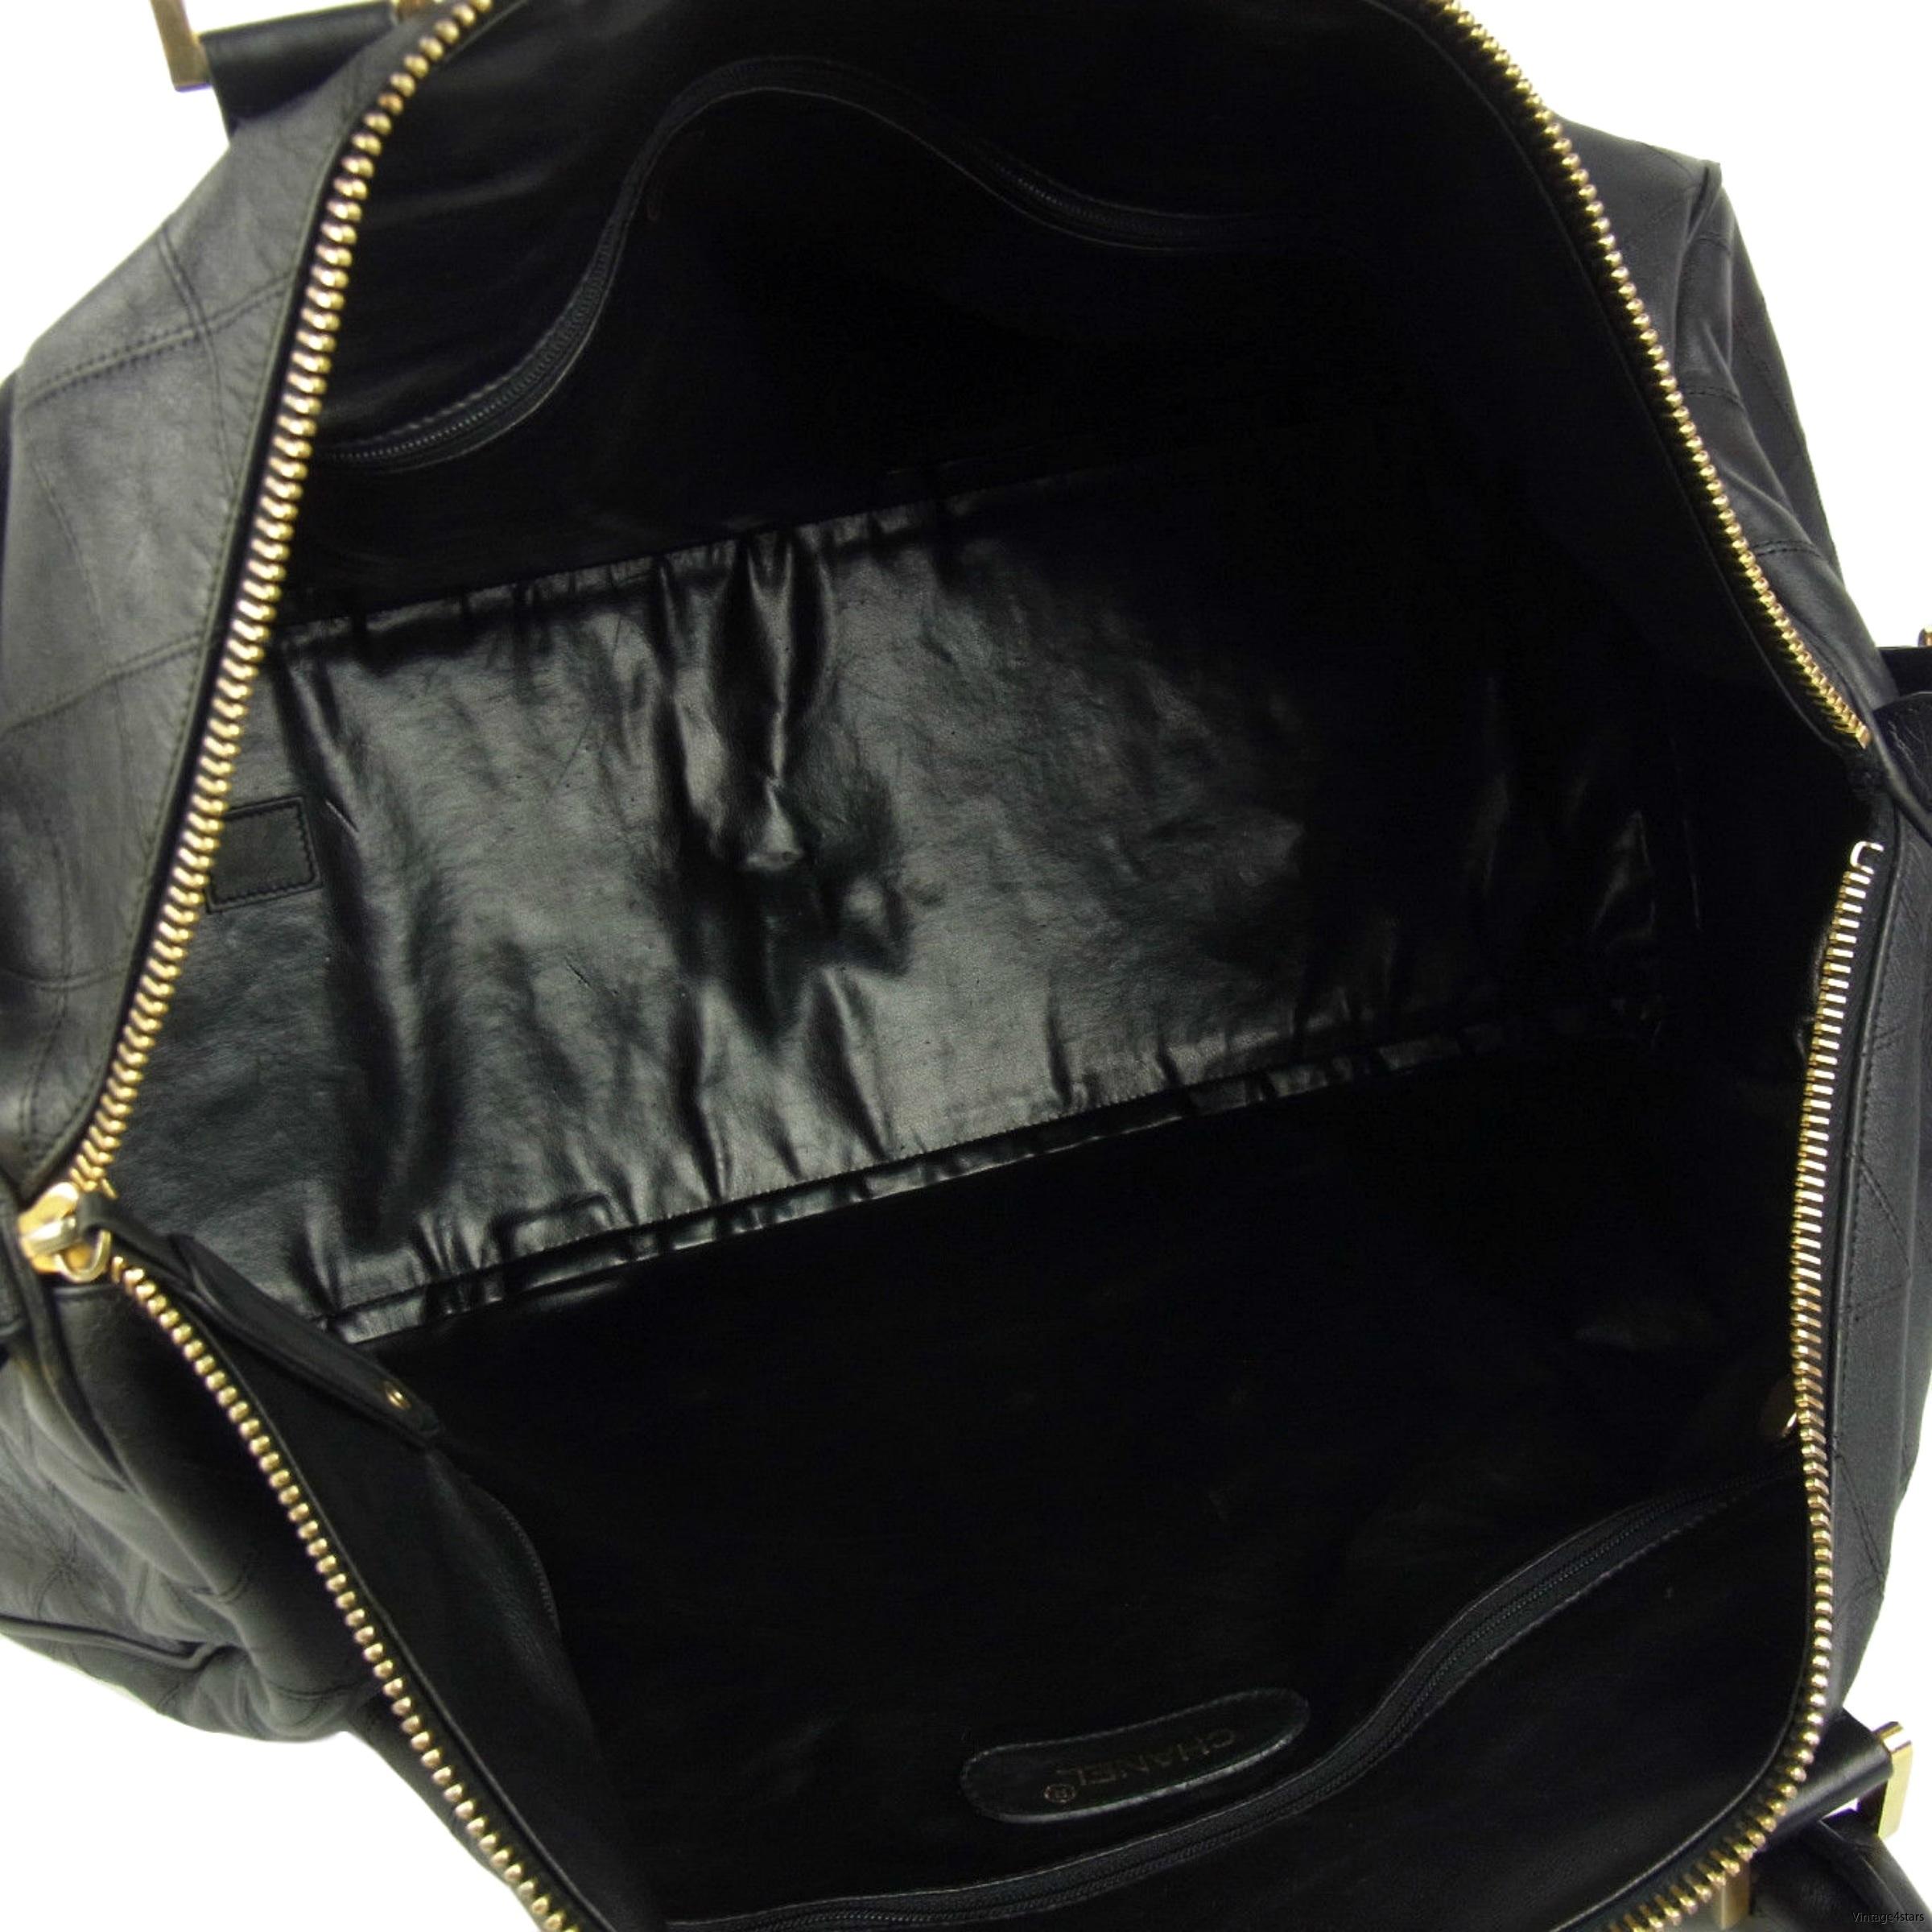 CHANEL Duffle Bag Qulited Calfskin 8